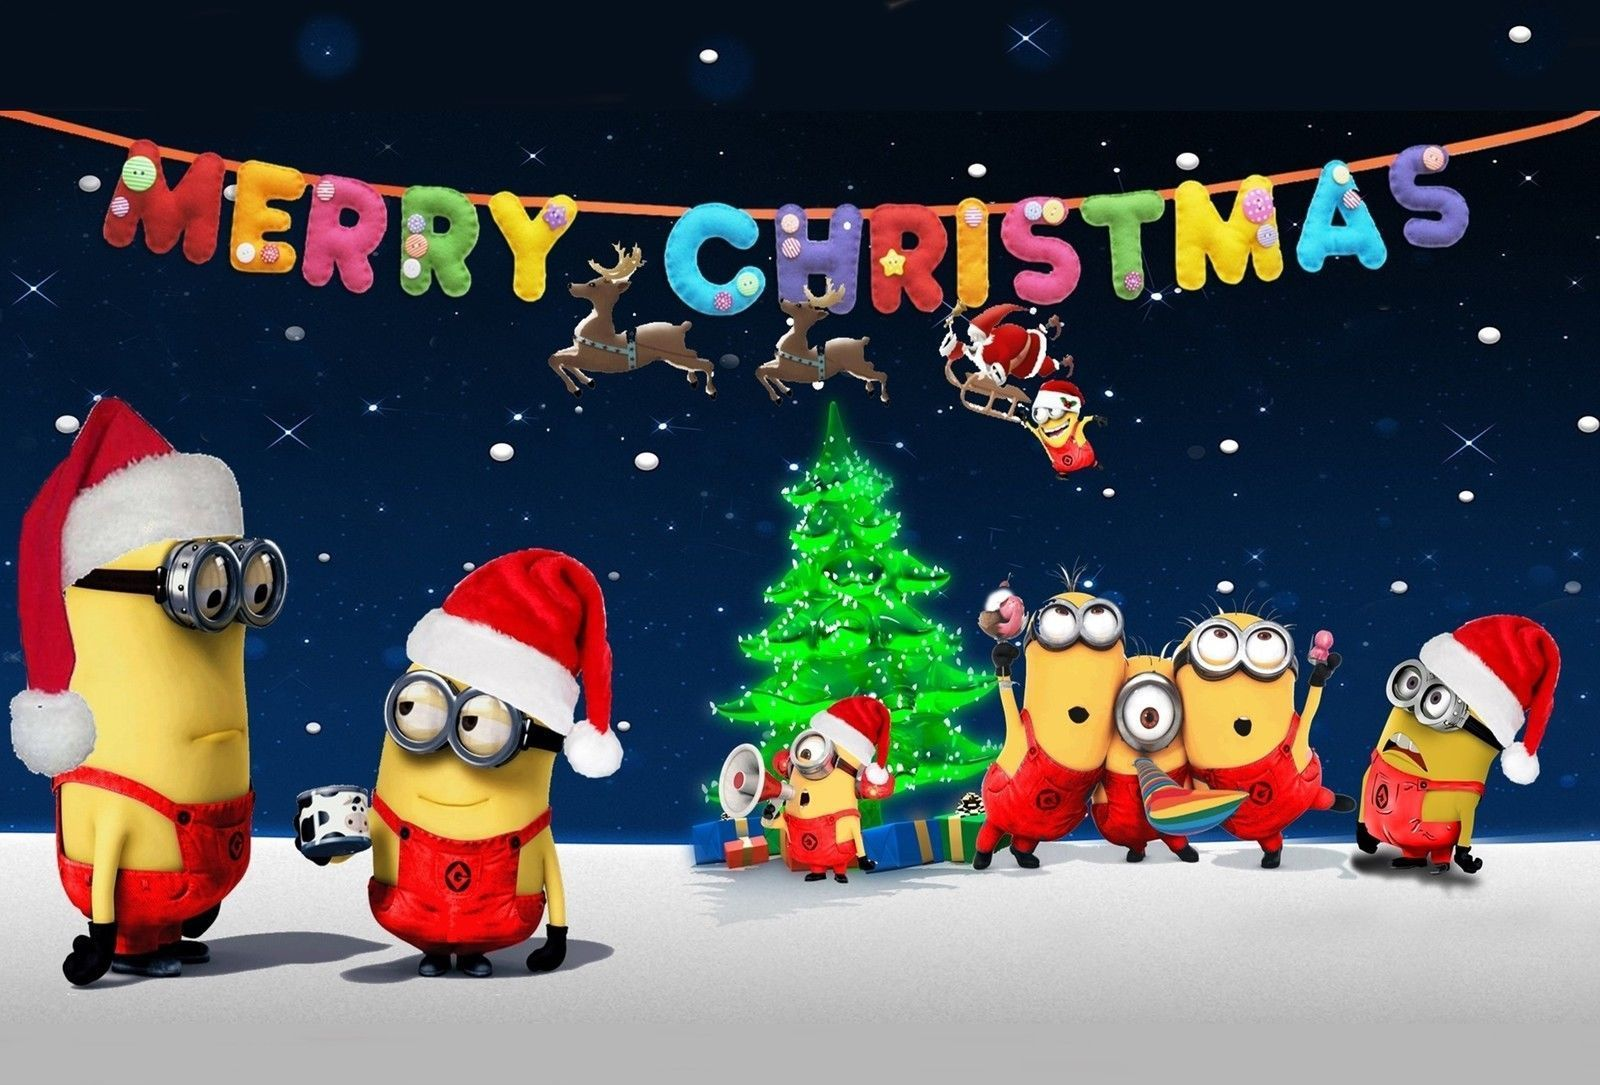 Minions Christmas Desktop Tablet Wallpaper Minion Christmas Minions Wallpaper Cute Minions